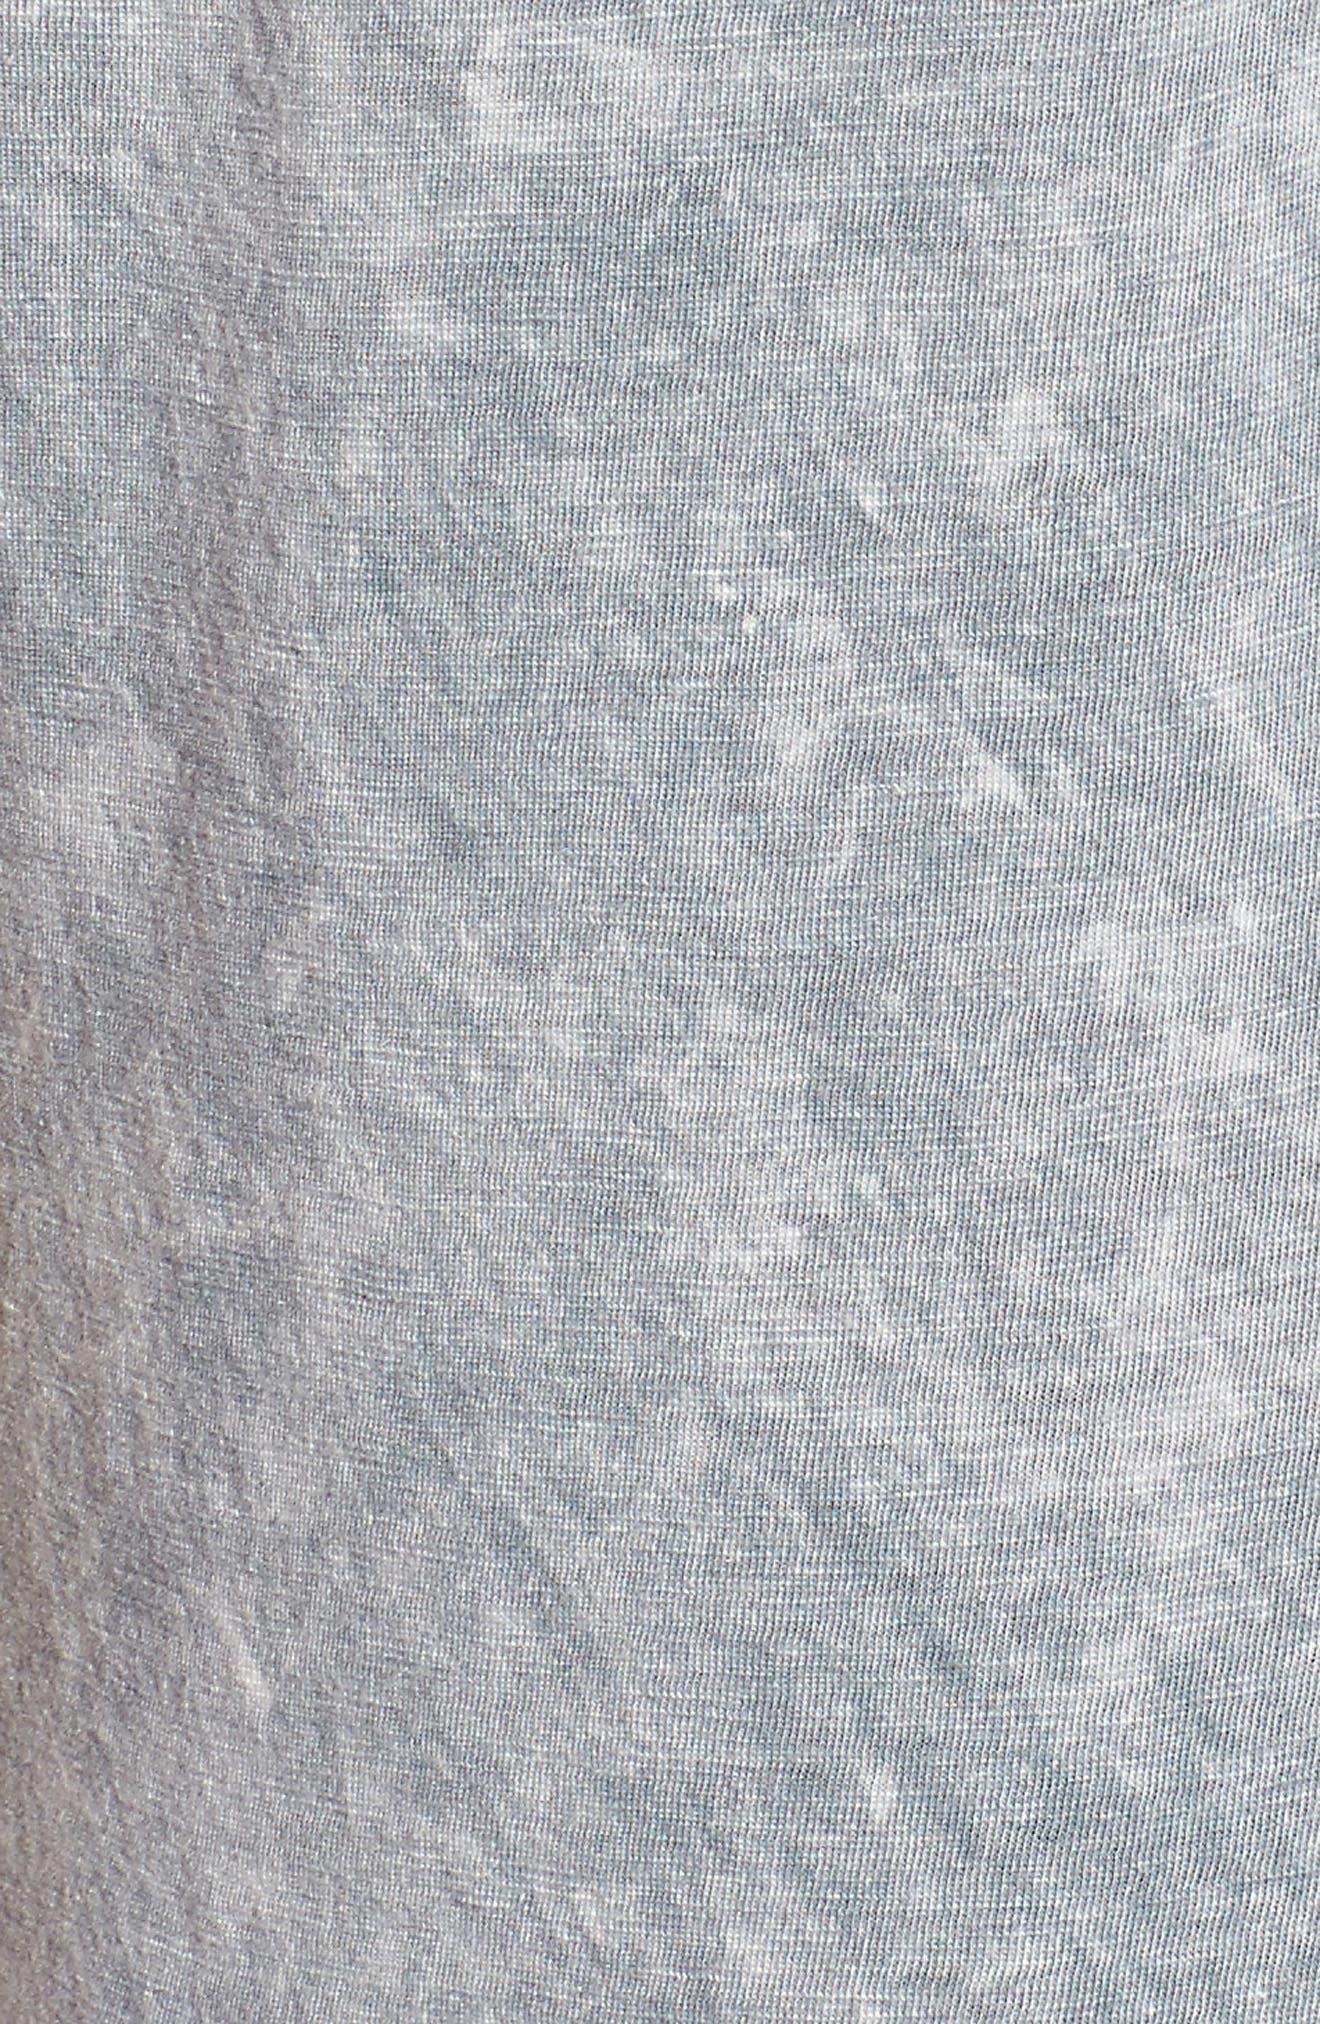 Mineral Wash Ruffle Hem Tee,                             Alternate thumbnail 5, color,                             Grey